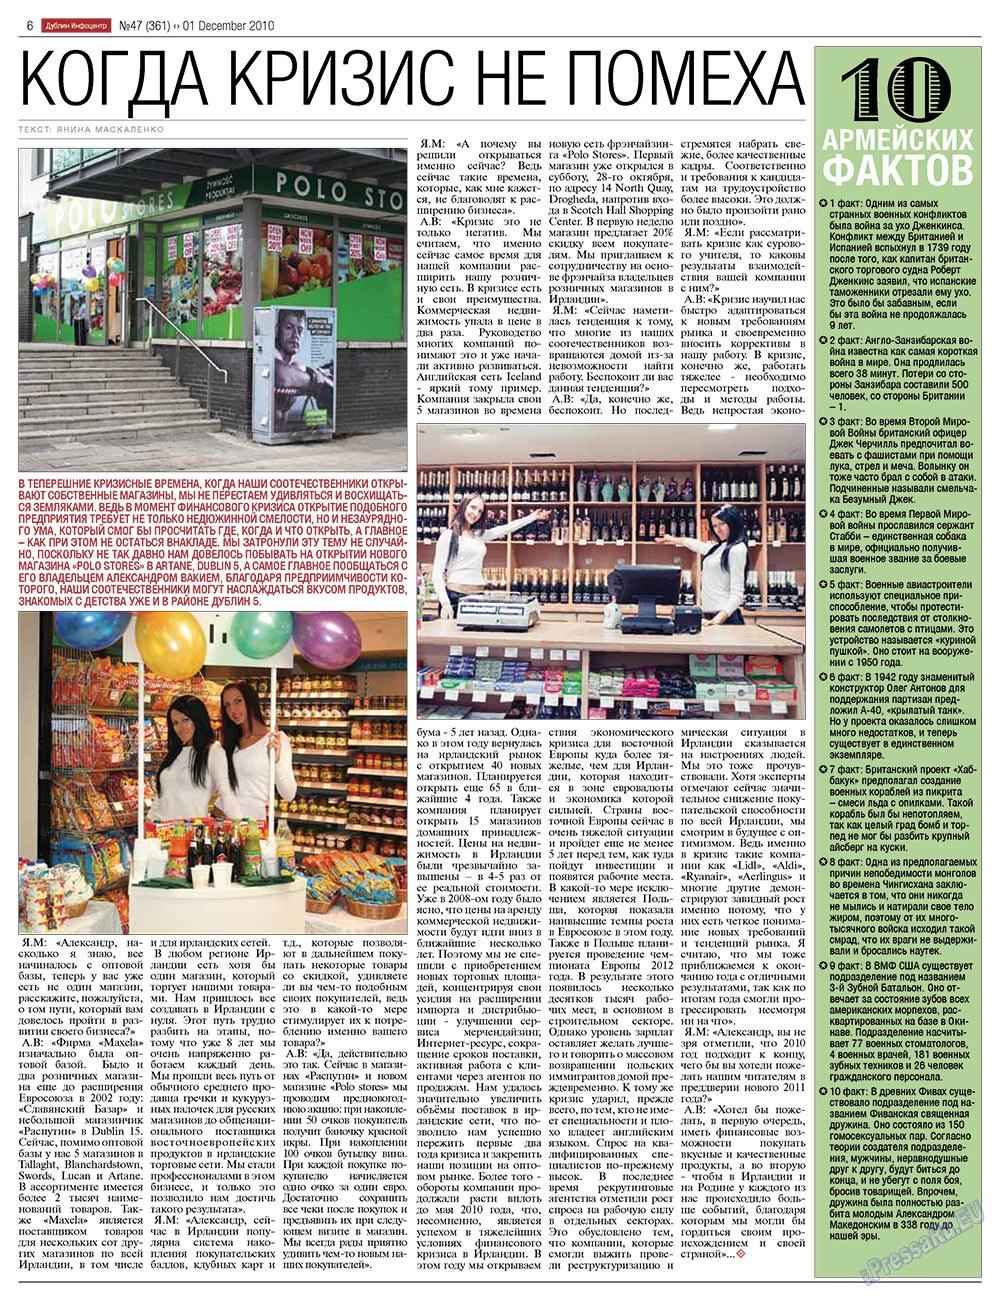 Дублин инфоцентр (газета). 2010 год, номер 47, стр. 6